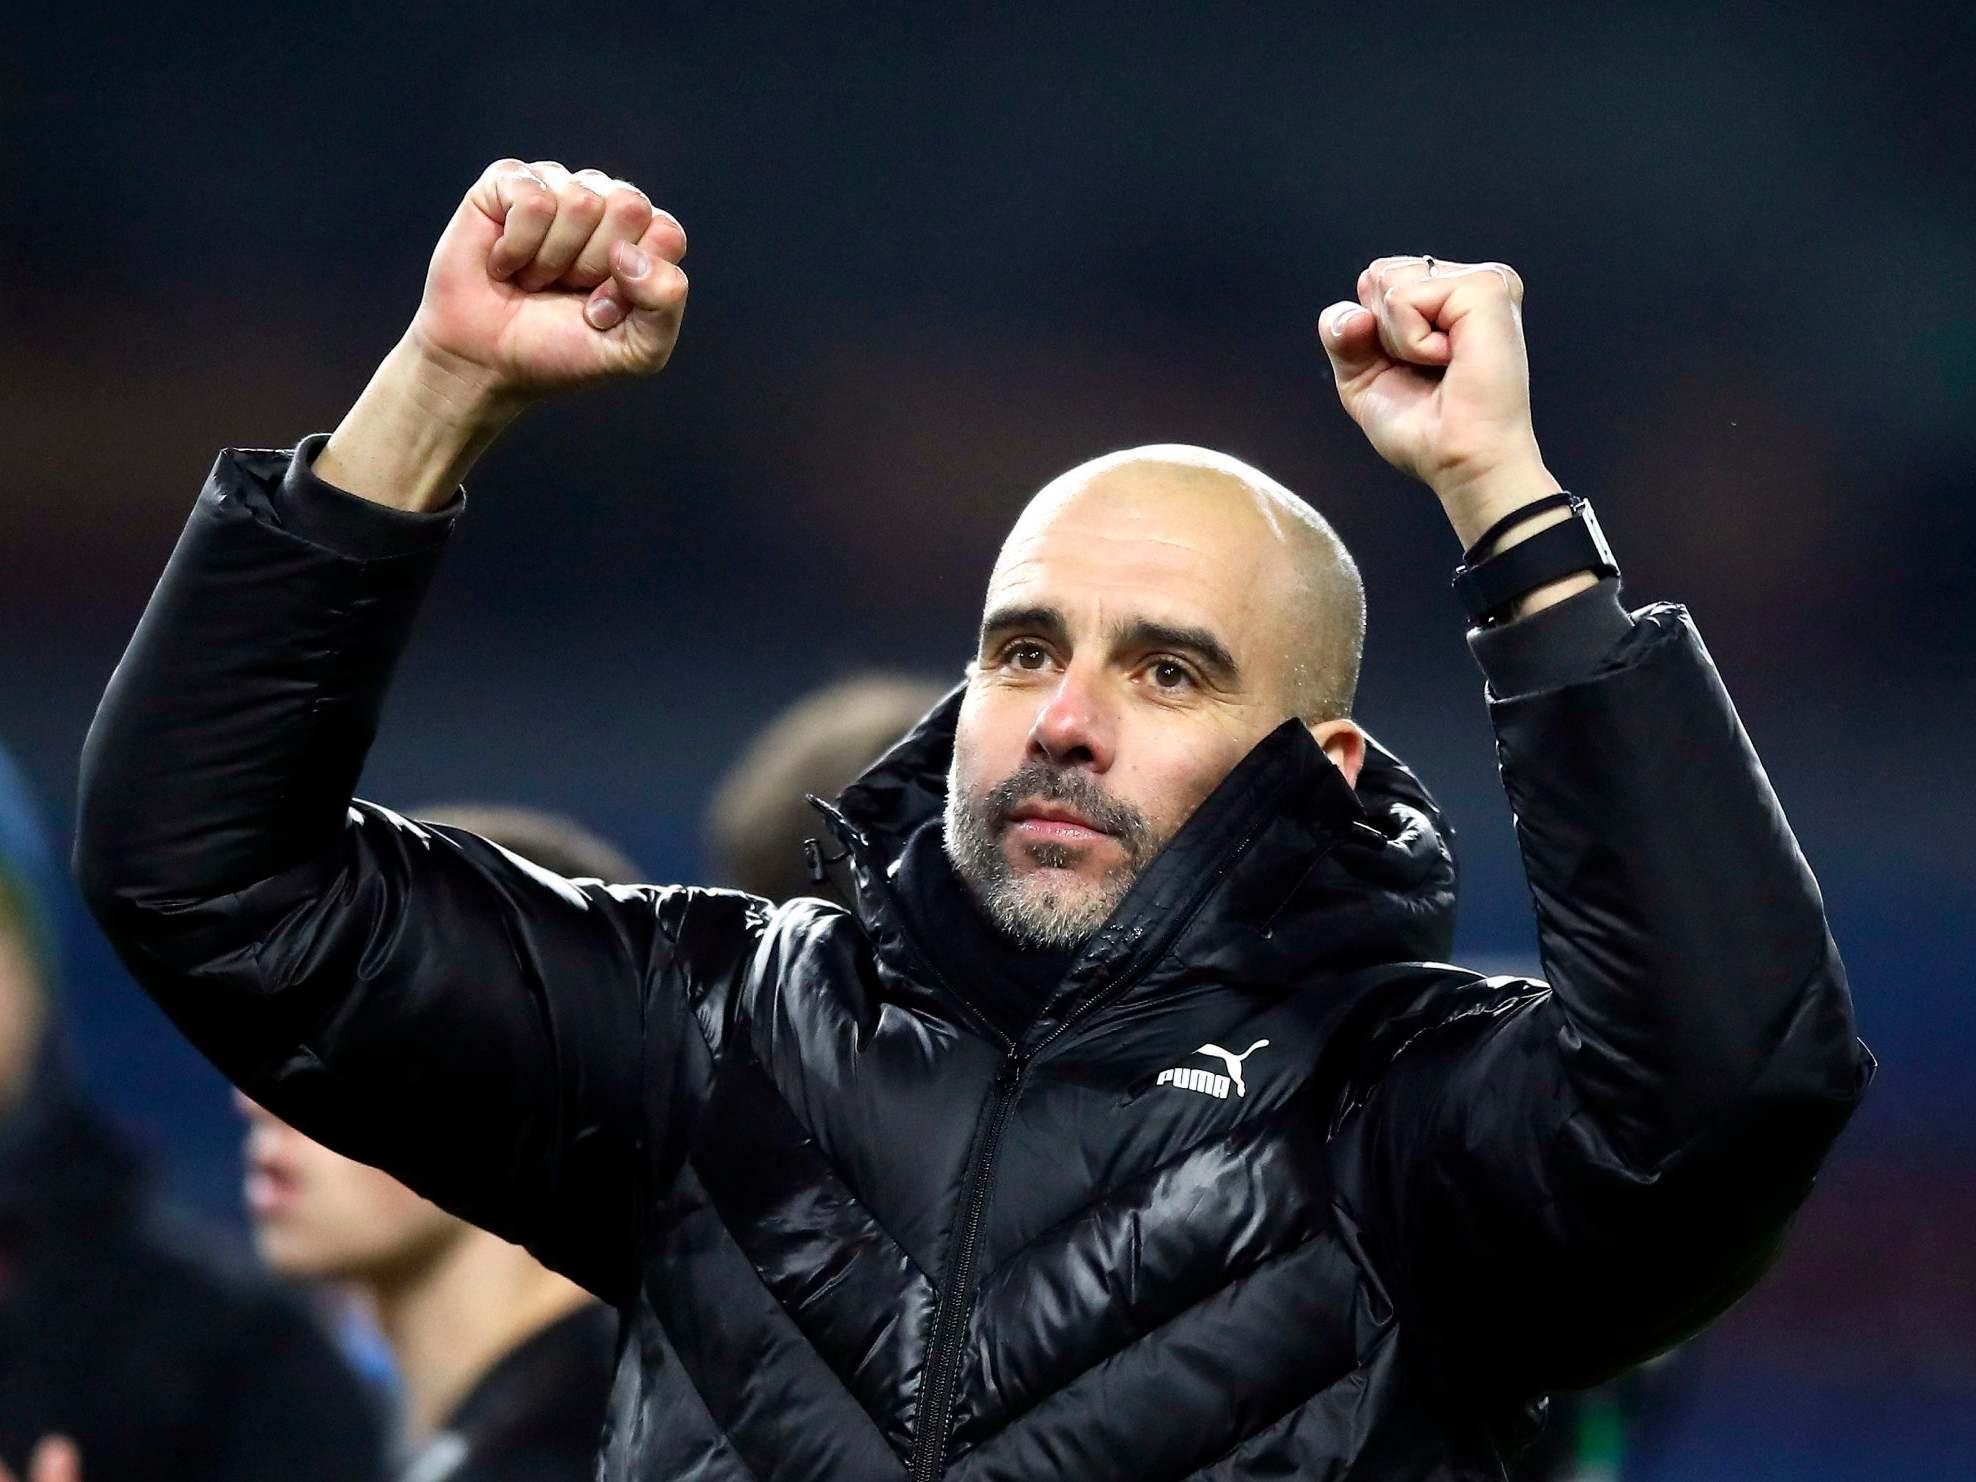 Man City vs Manchester United: Pep Guardiola responds to Ole Gunnar Solskjaer's derby taunts